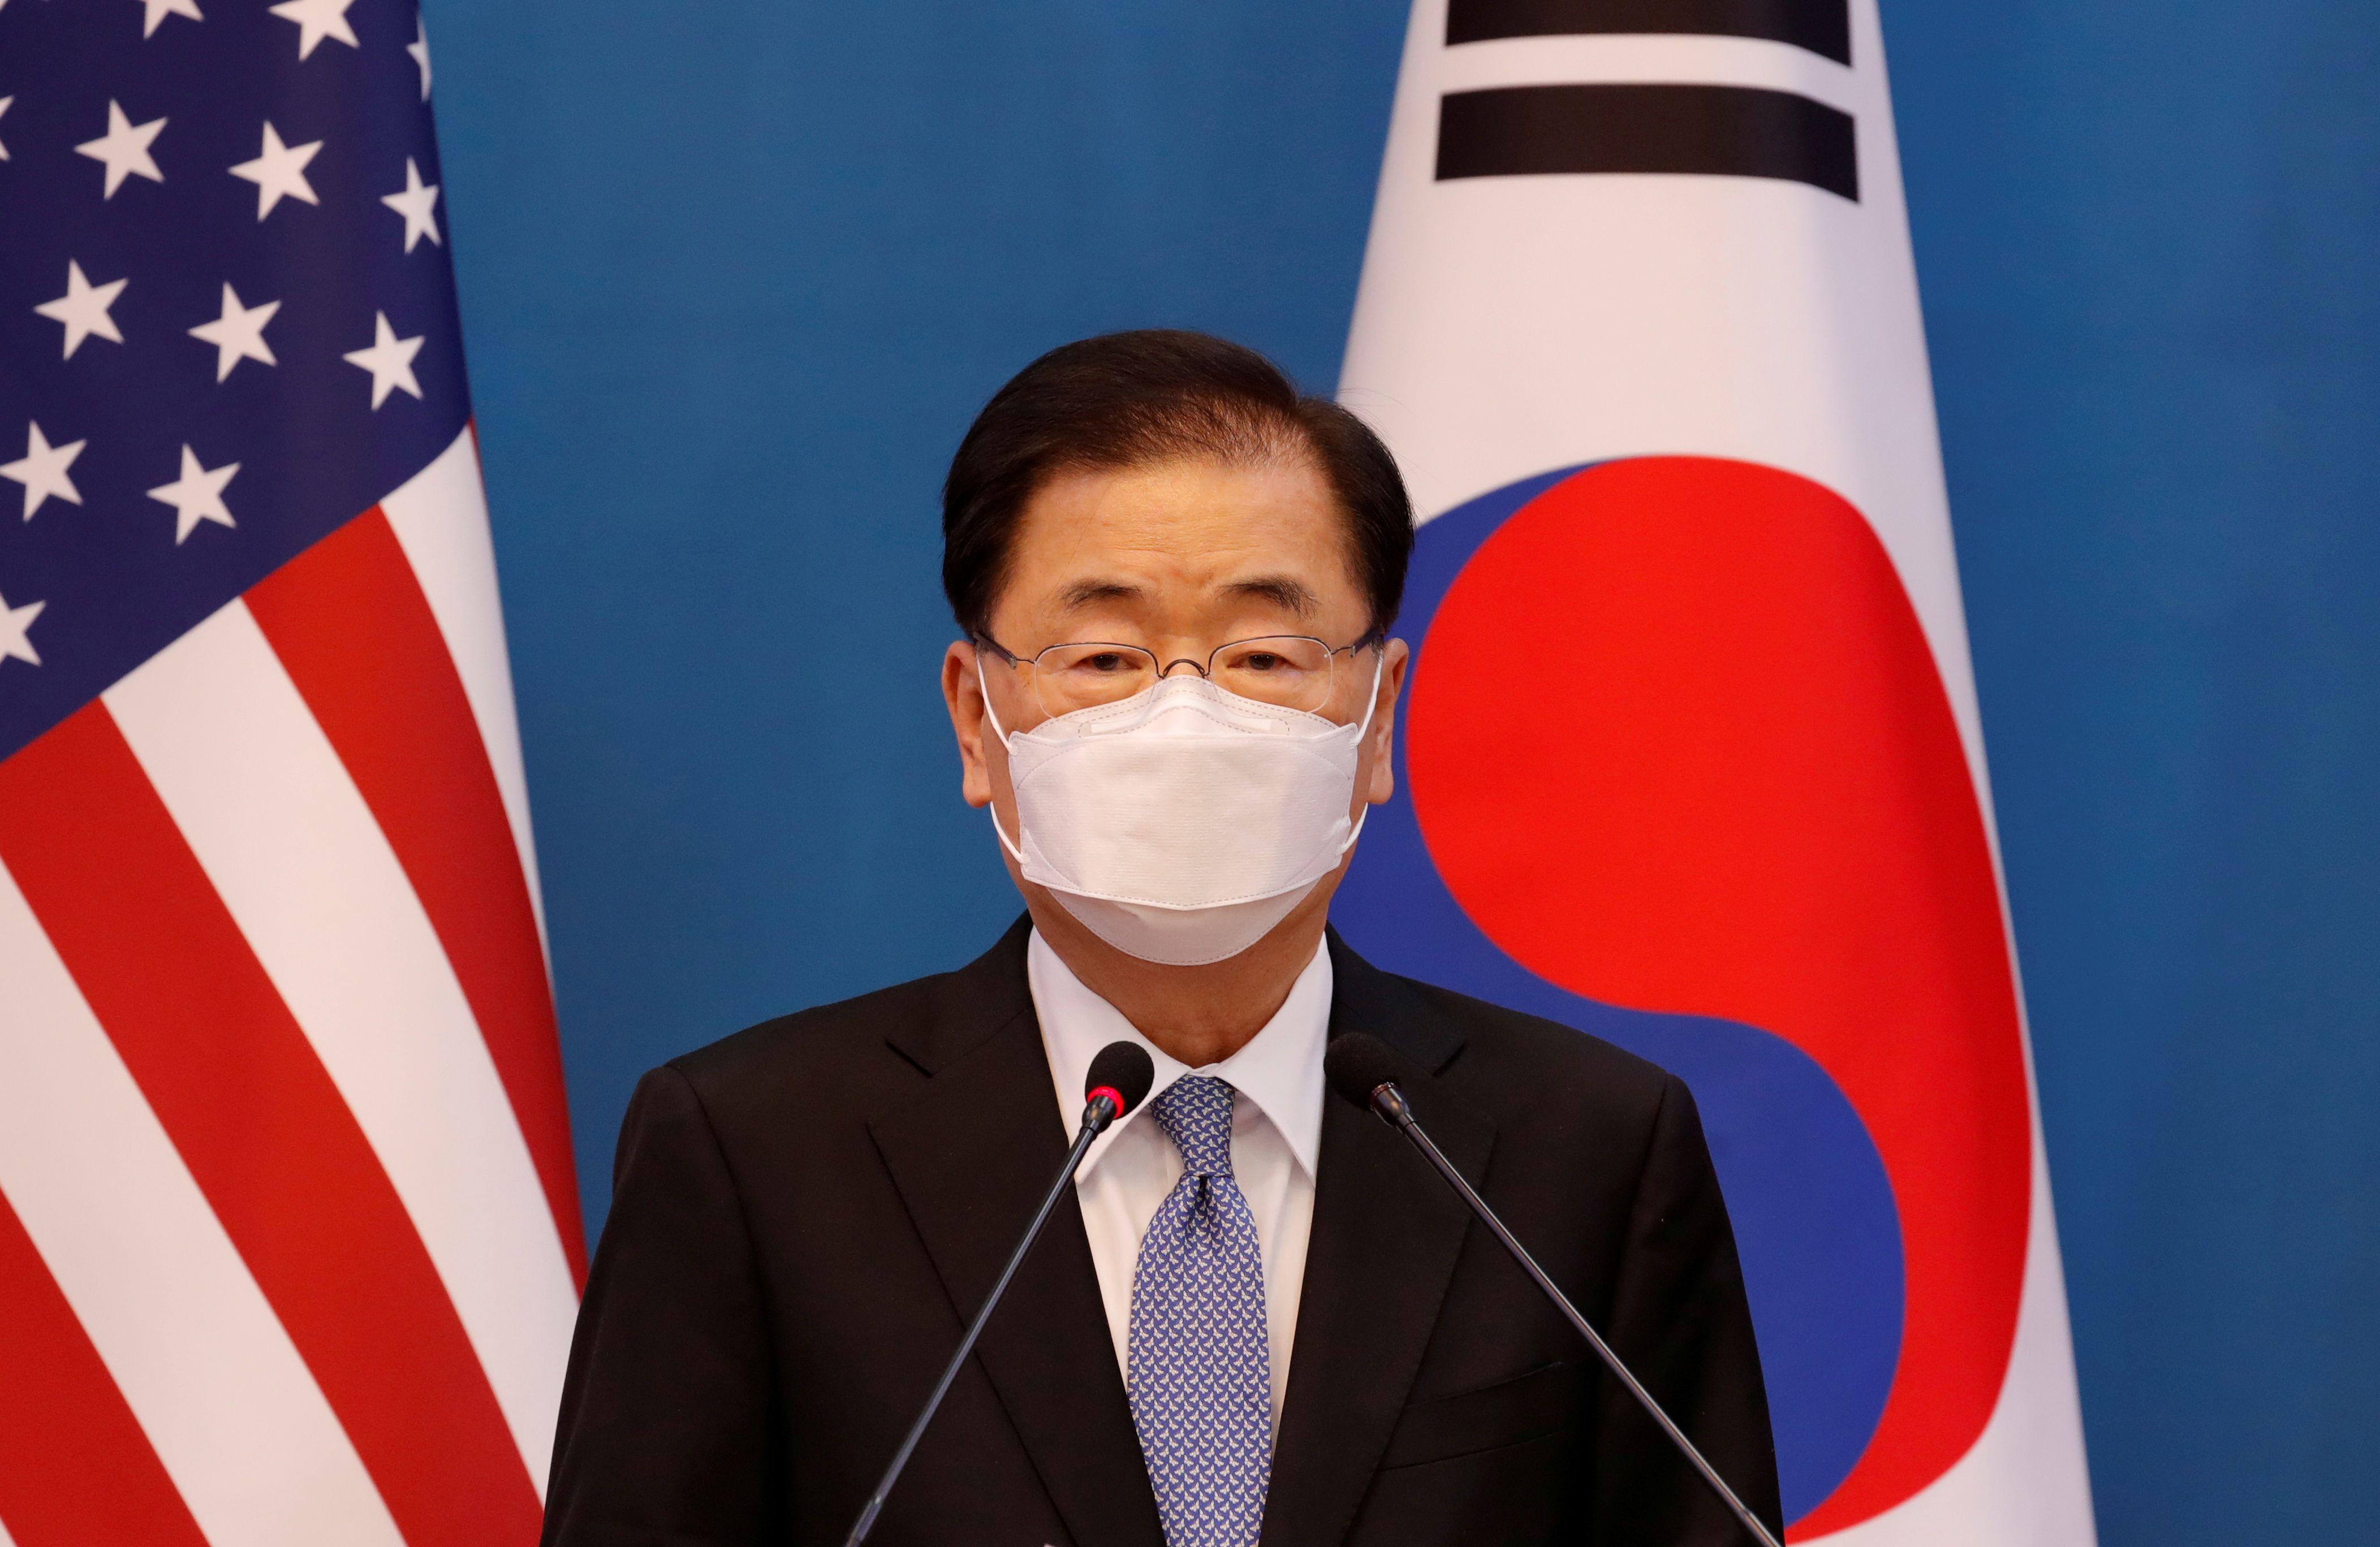 El canciller de Corea del Sur, Chung Eui Yong